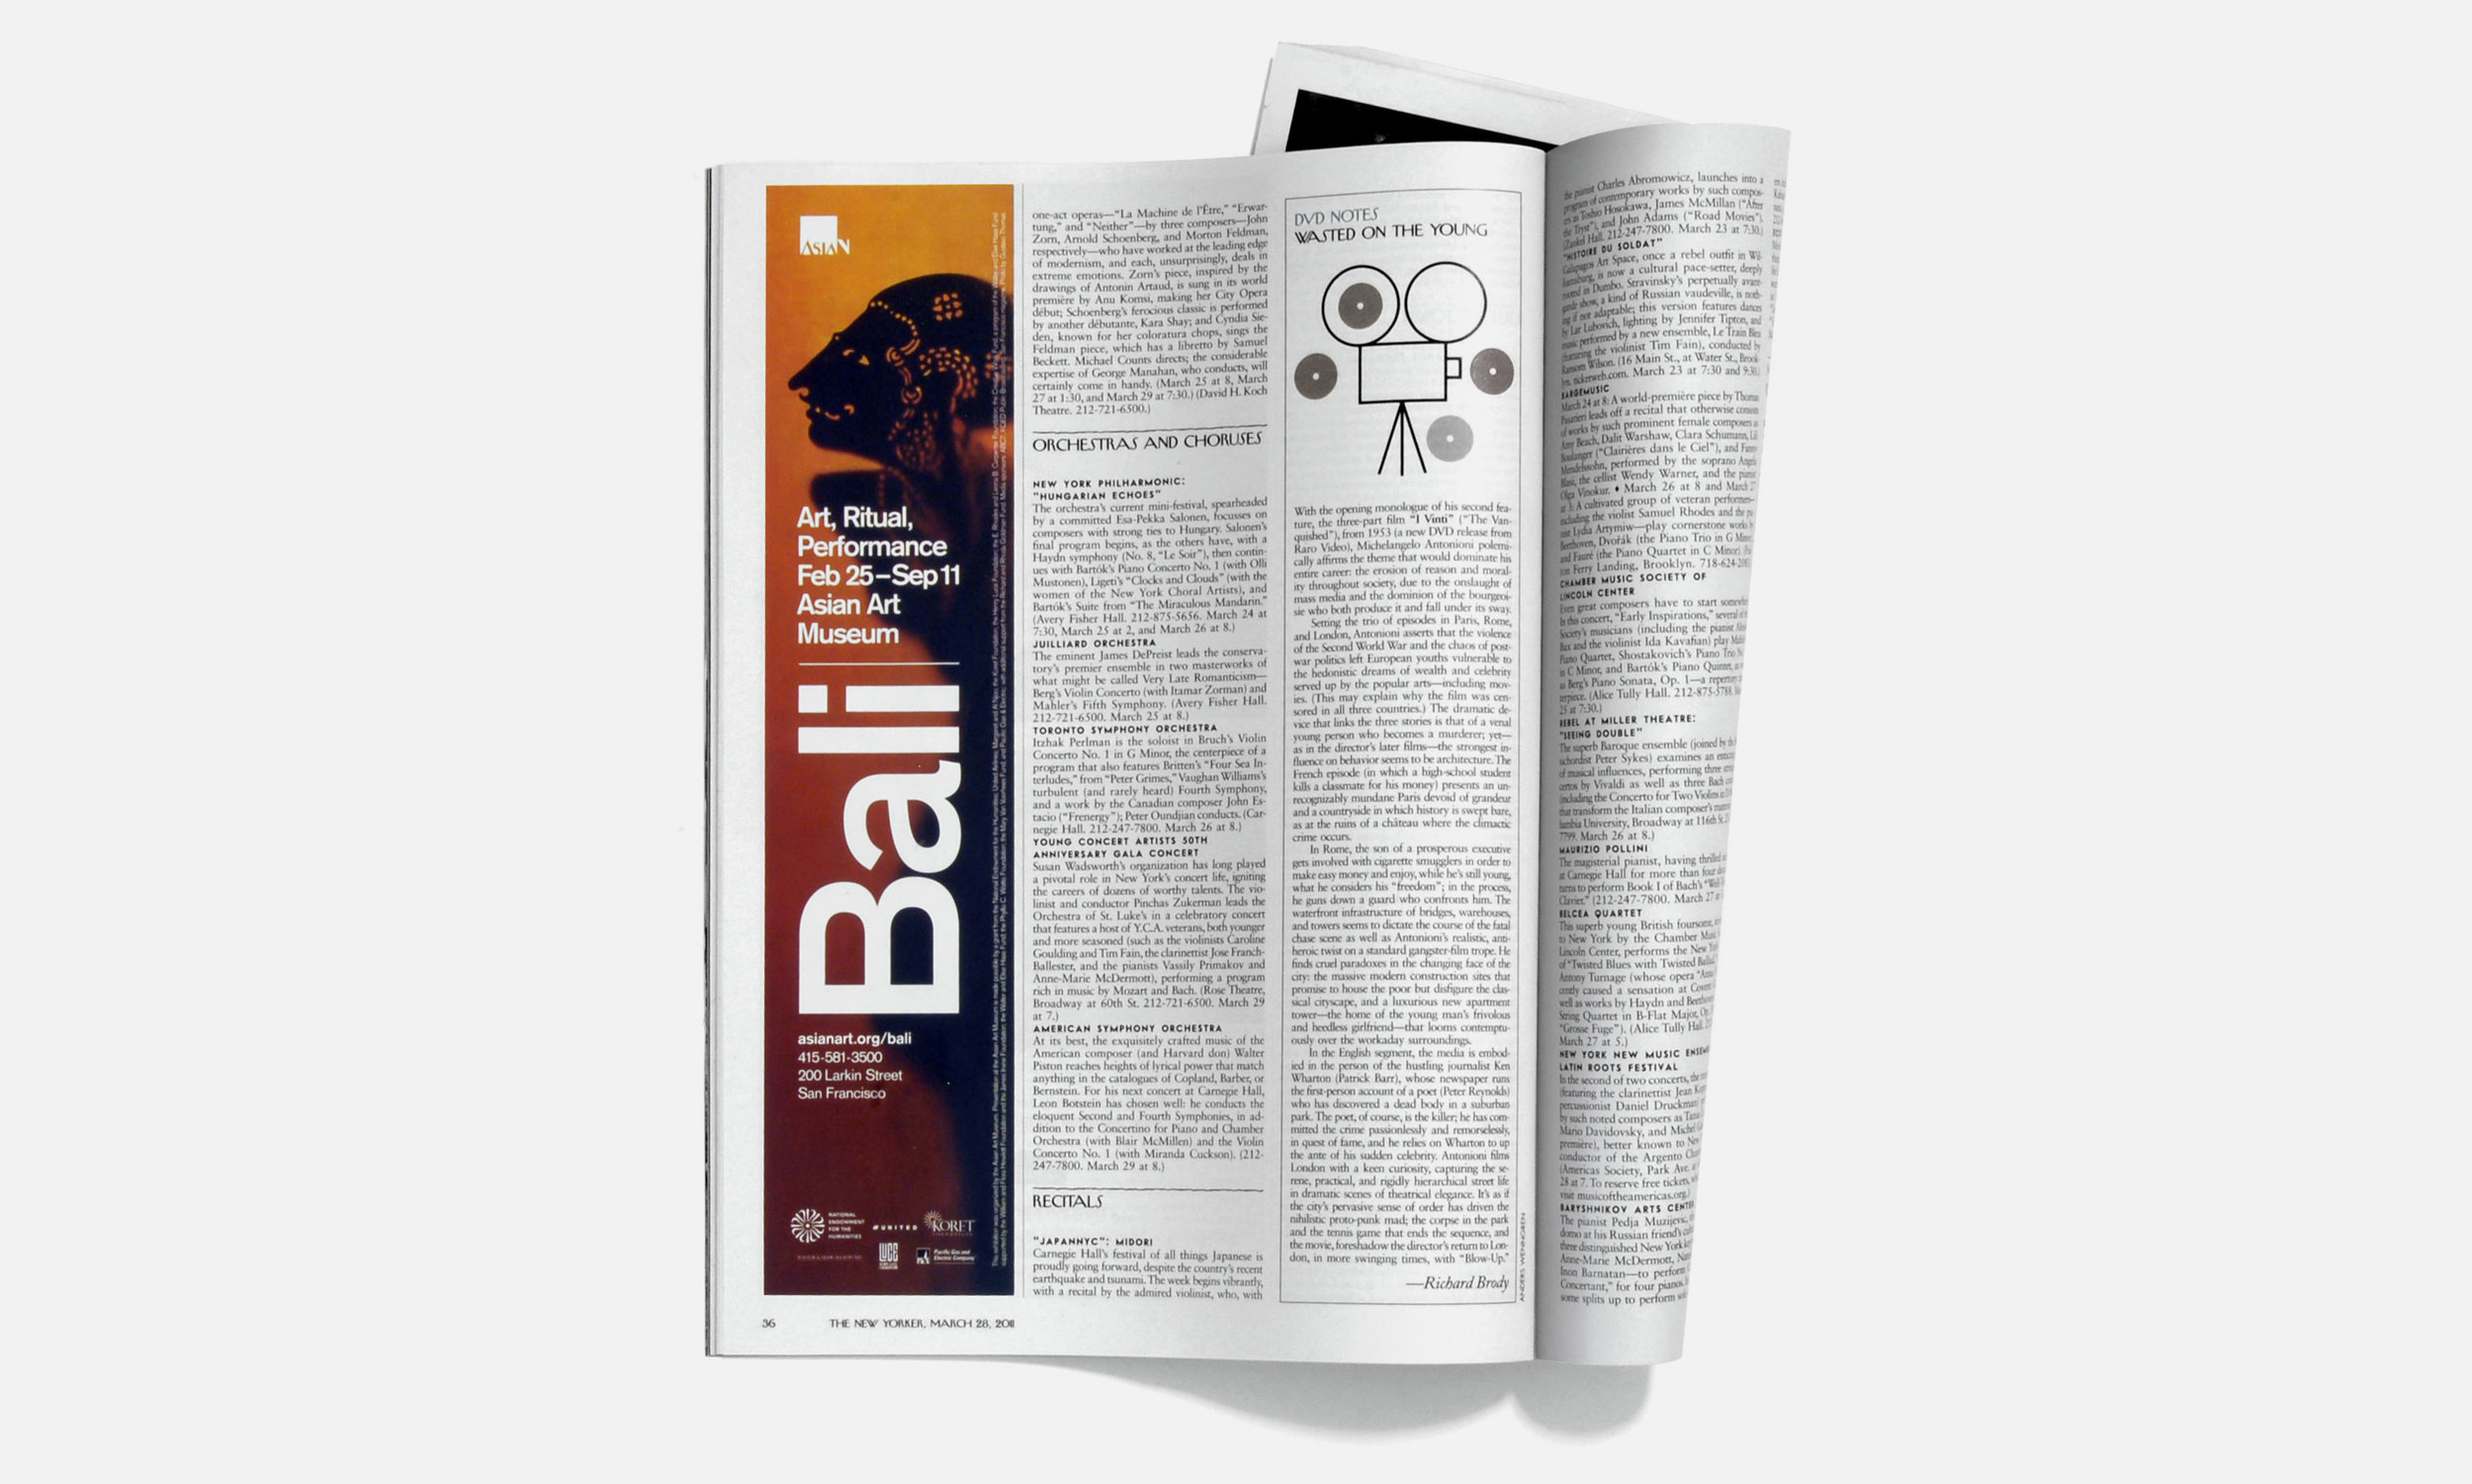 2000x1200-AAM-Bali-New-Yorker2.jpg